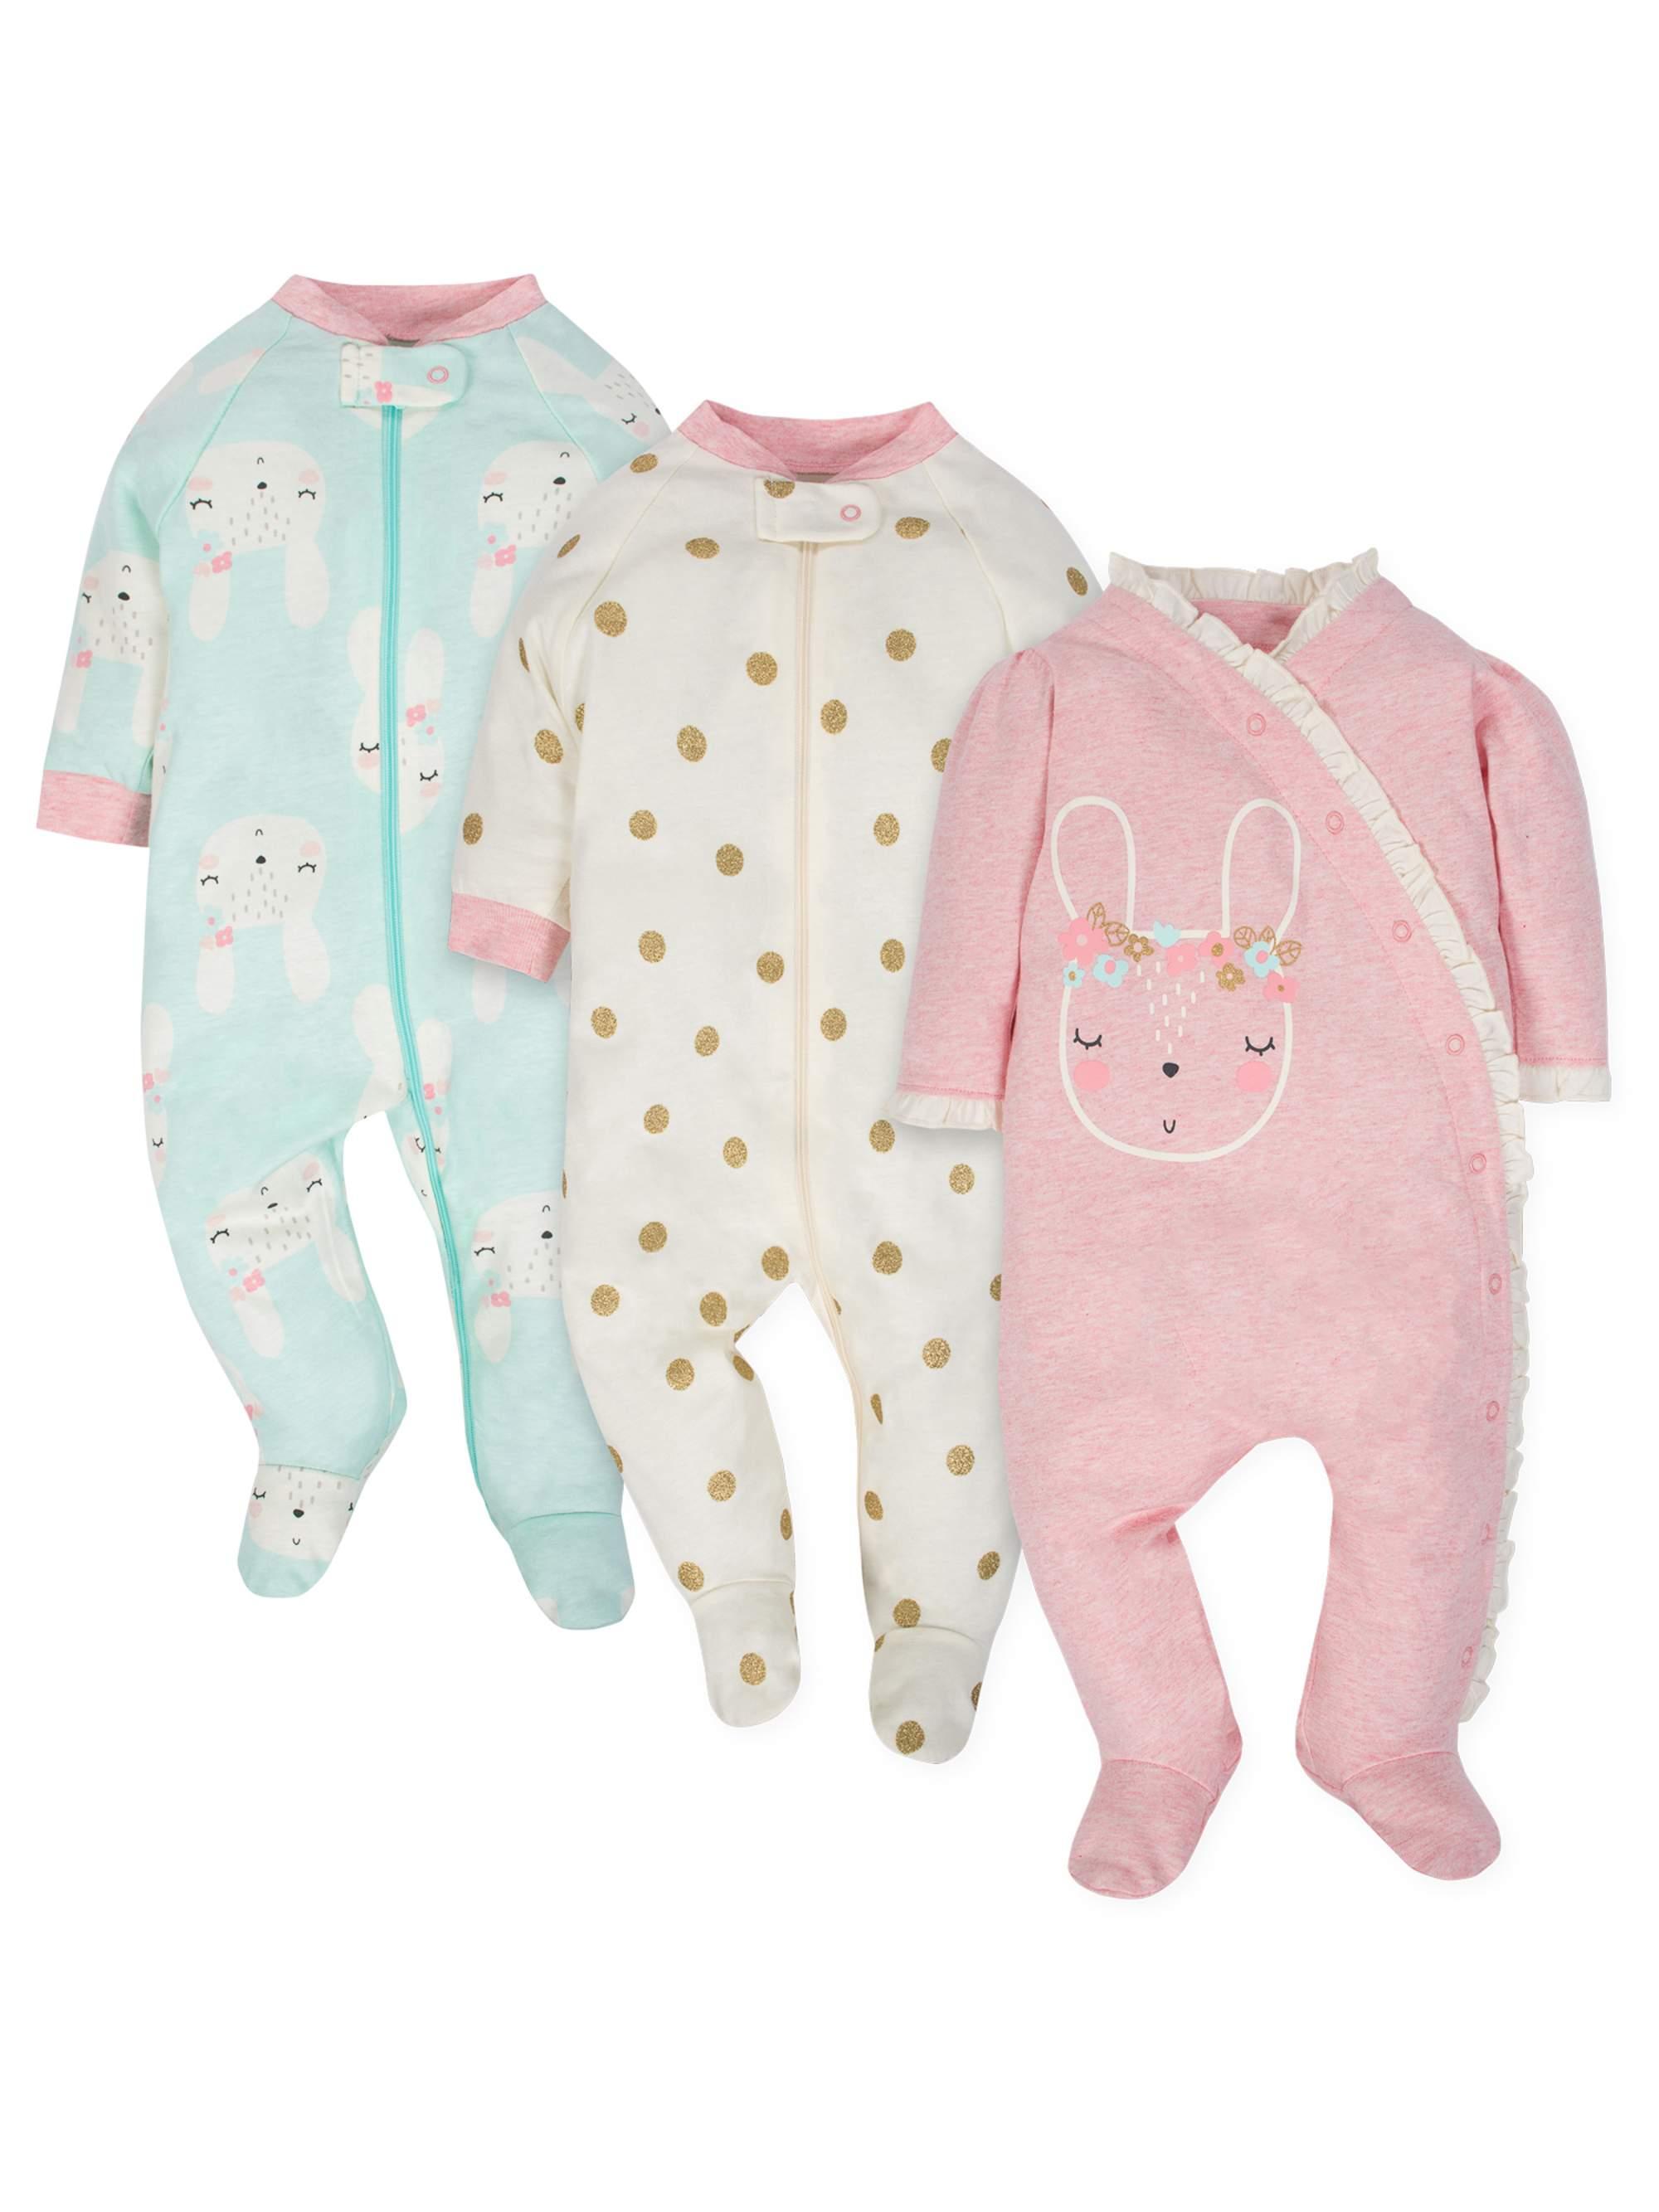 Baby Clothing Walmart Com